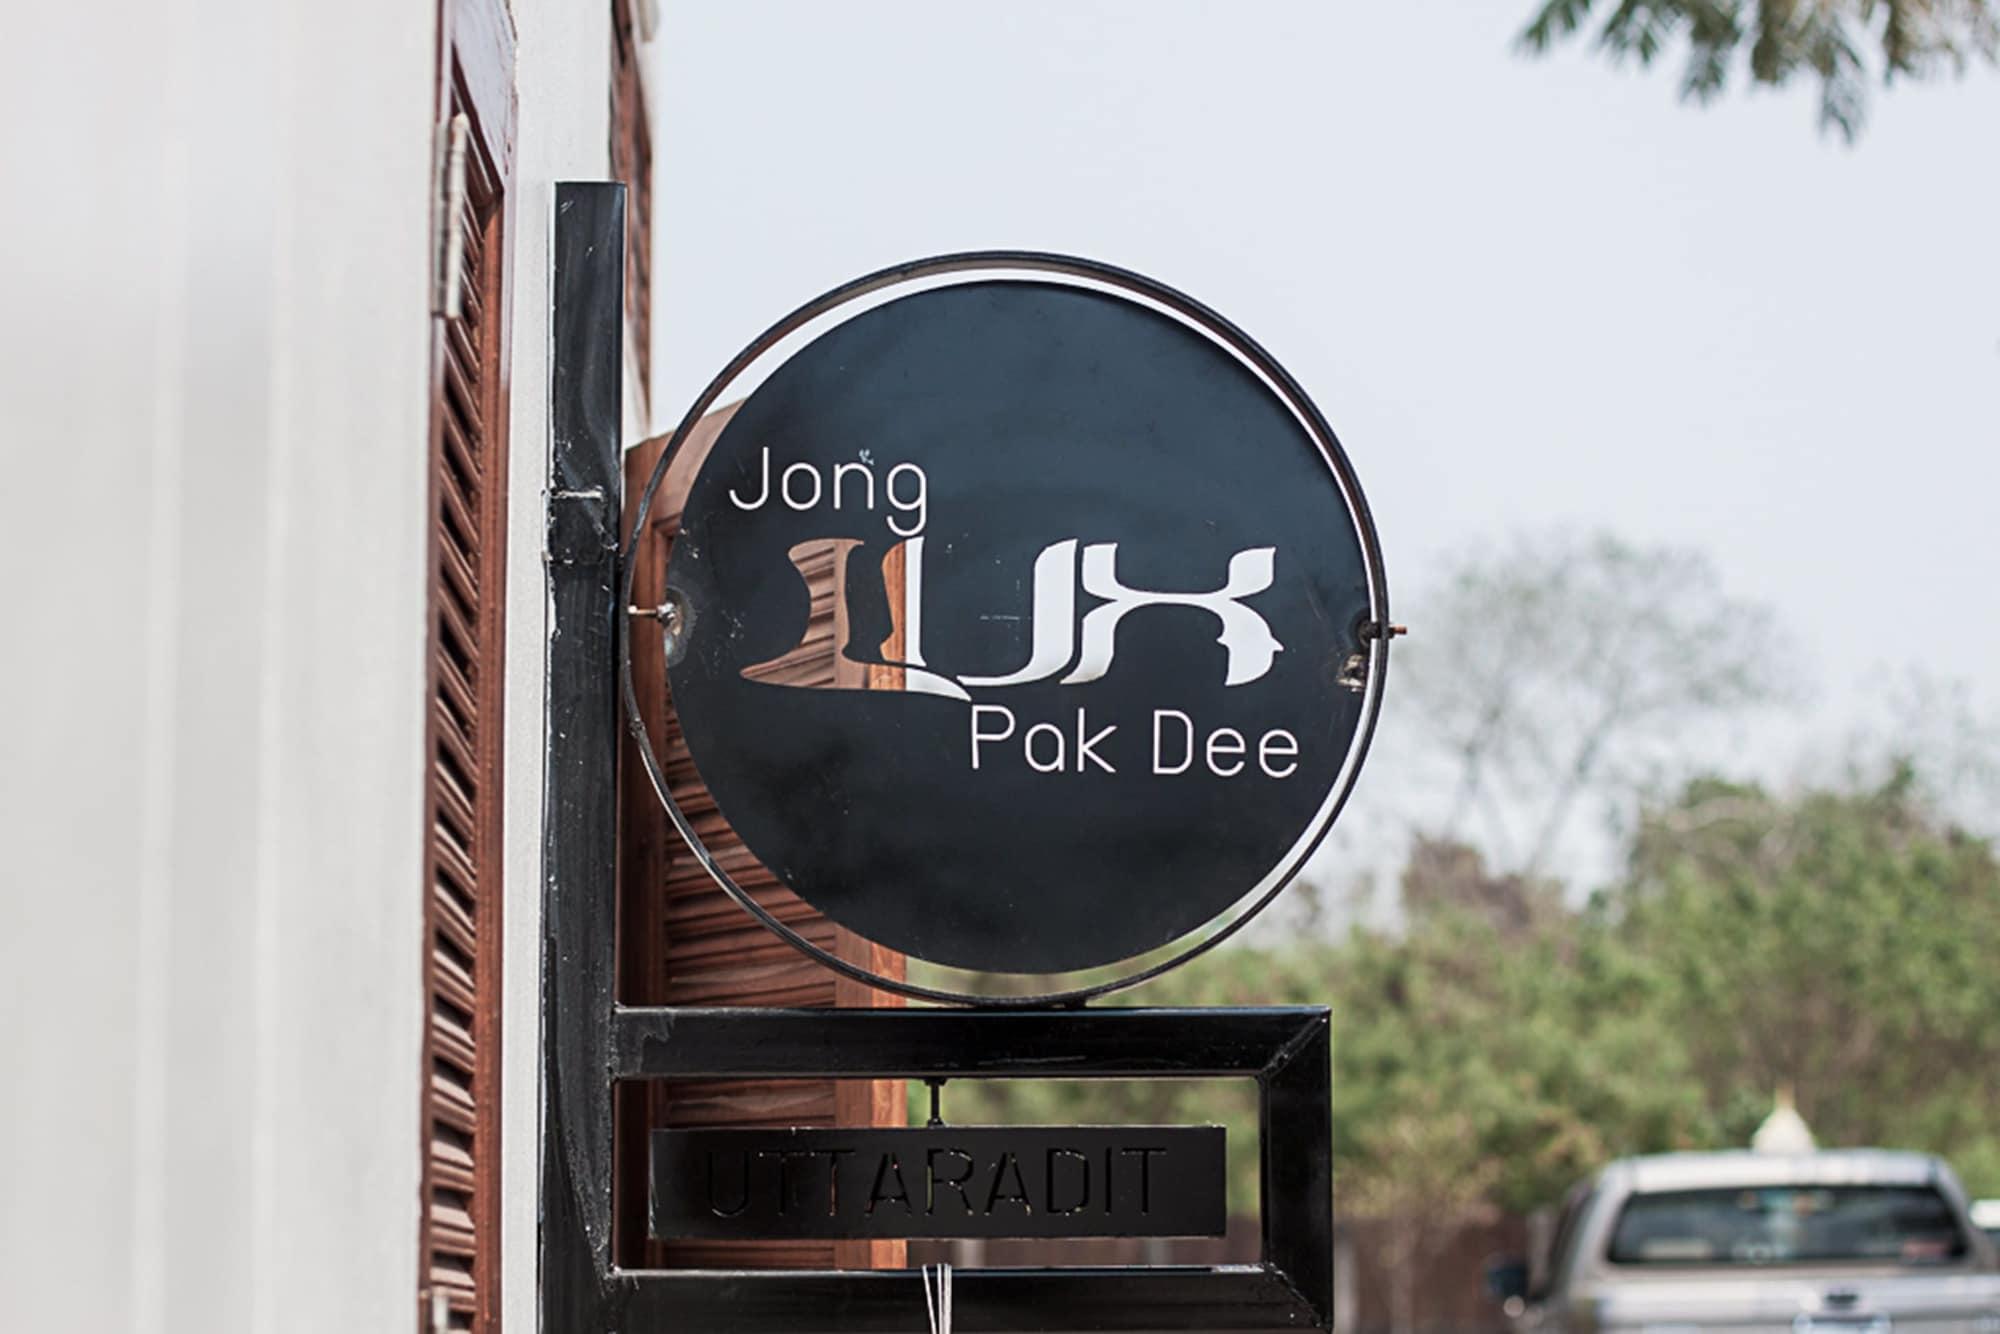 Jong Lux Pak Dee, Muang Uttaradit